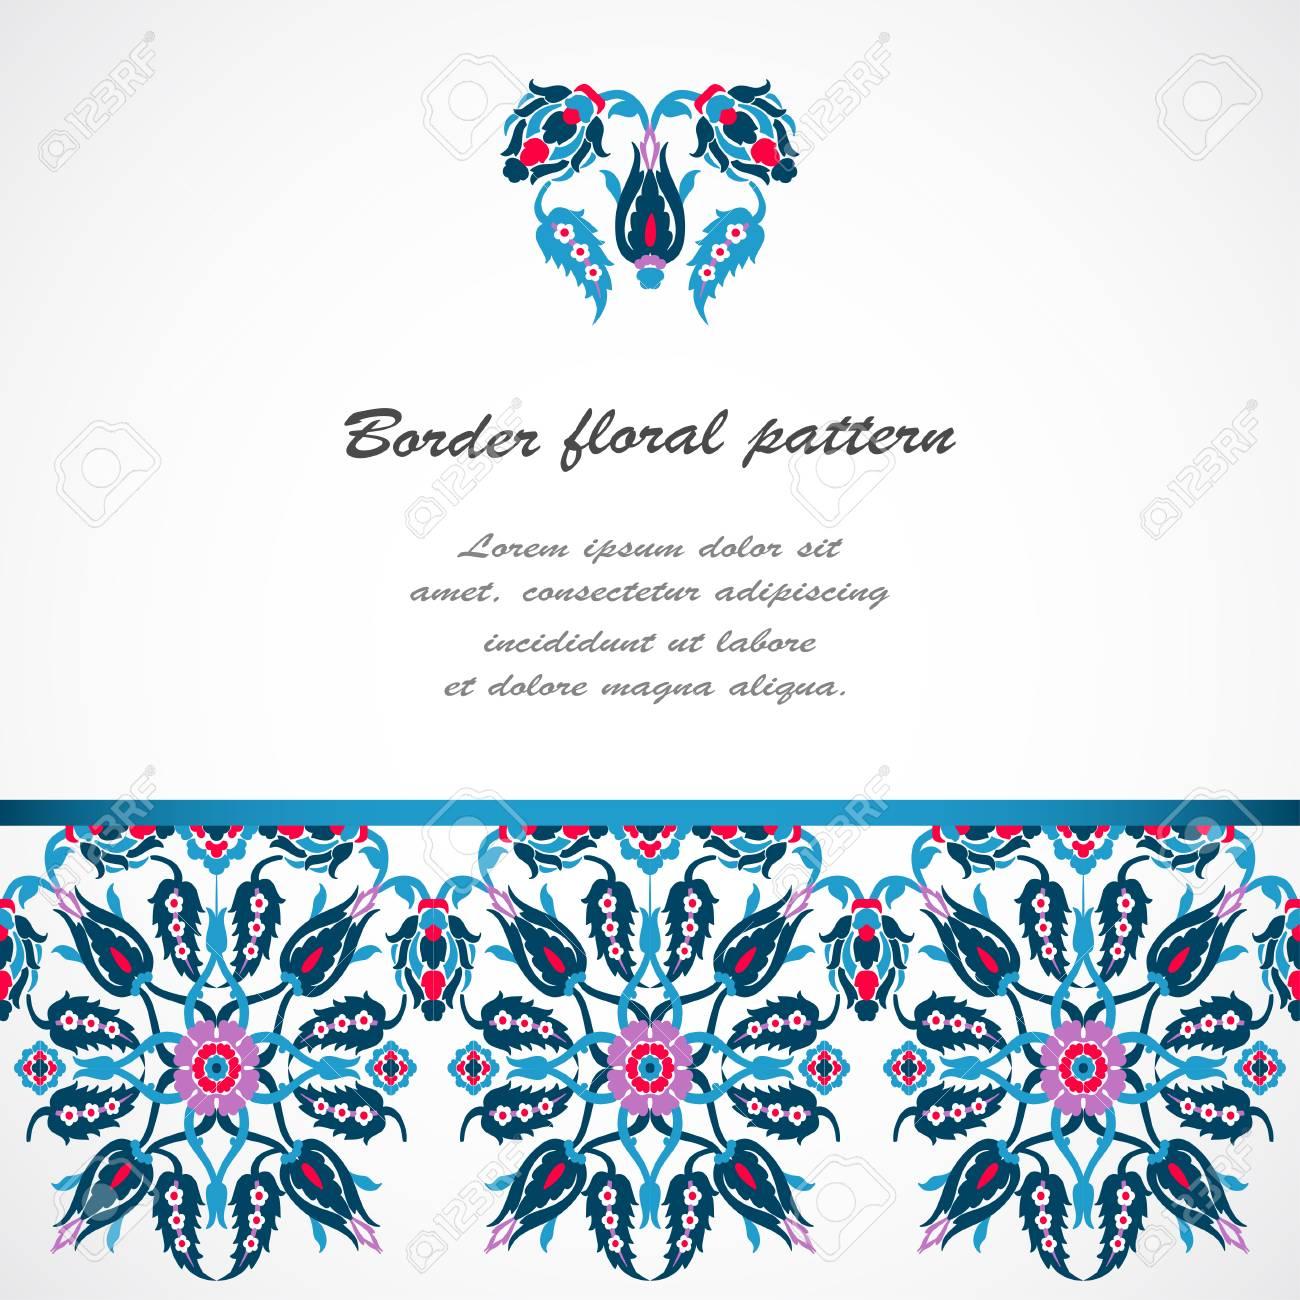 8d477e1590c1 Arabesque vintage seamless border design template vector. Eastern style  pattern. Elegant floral decoration print